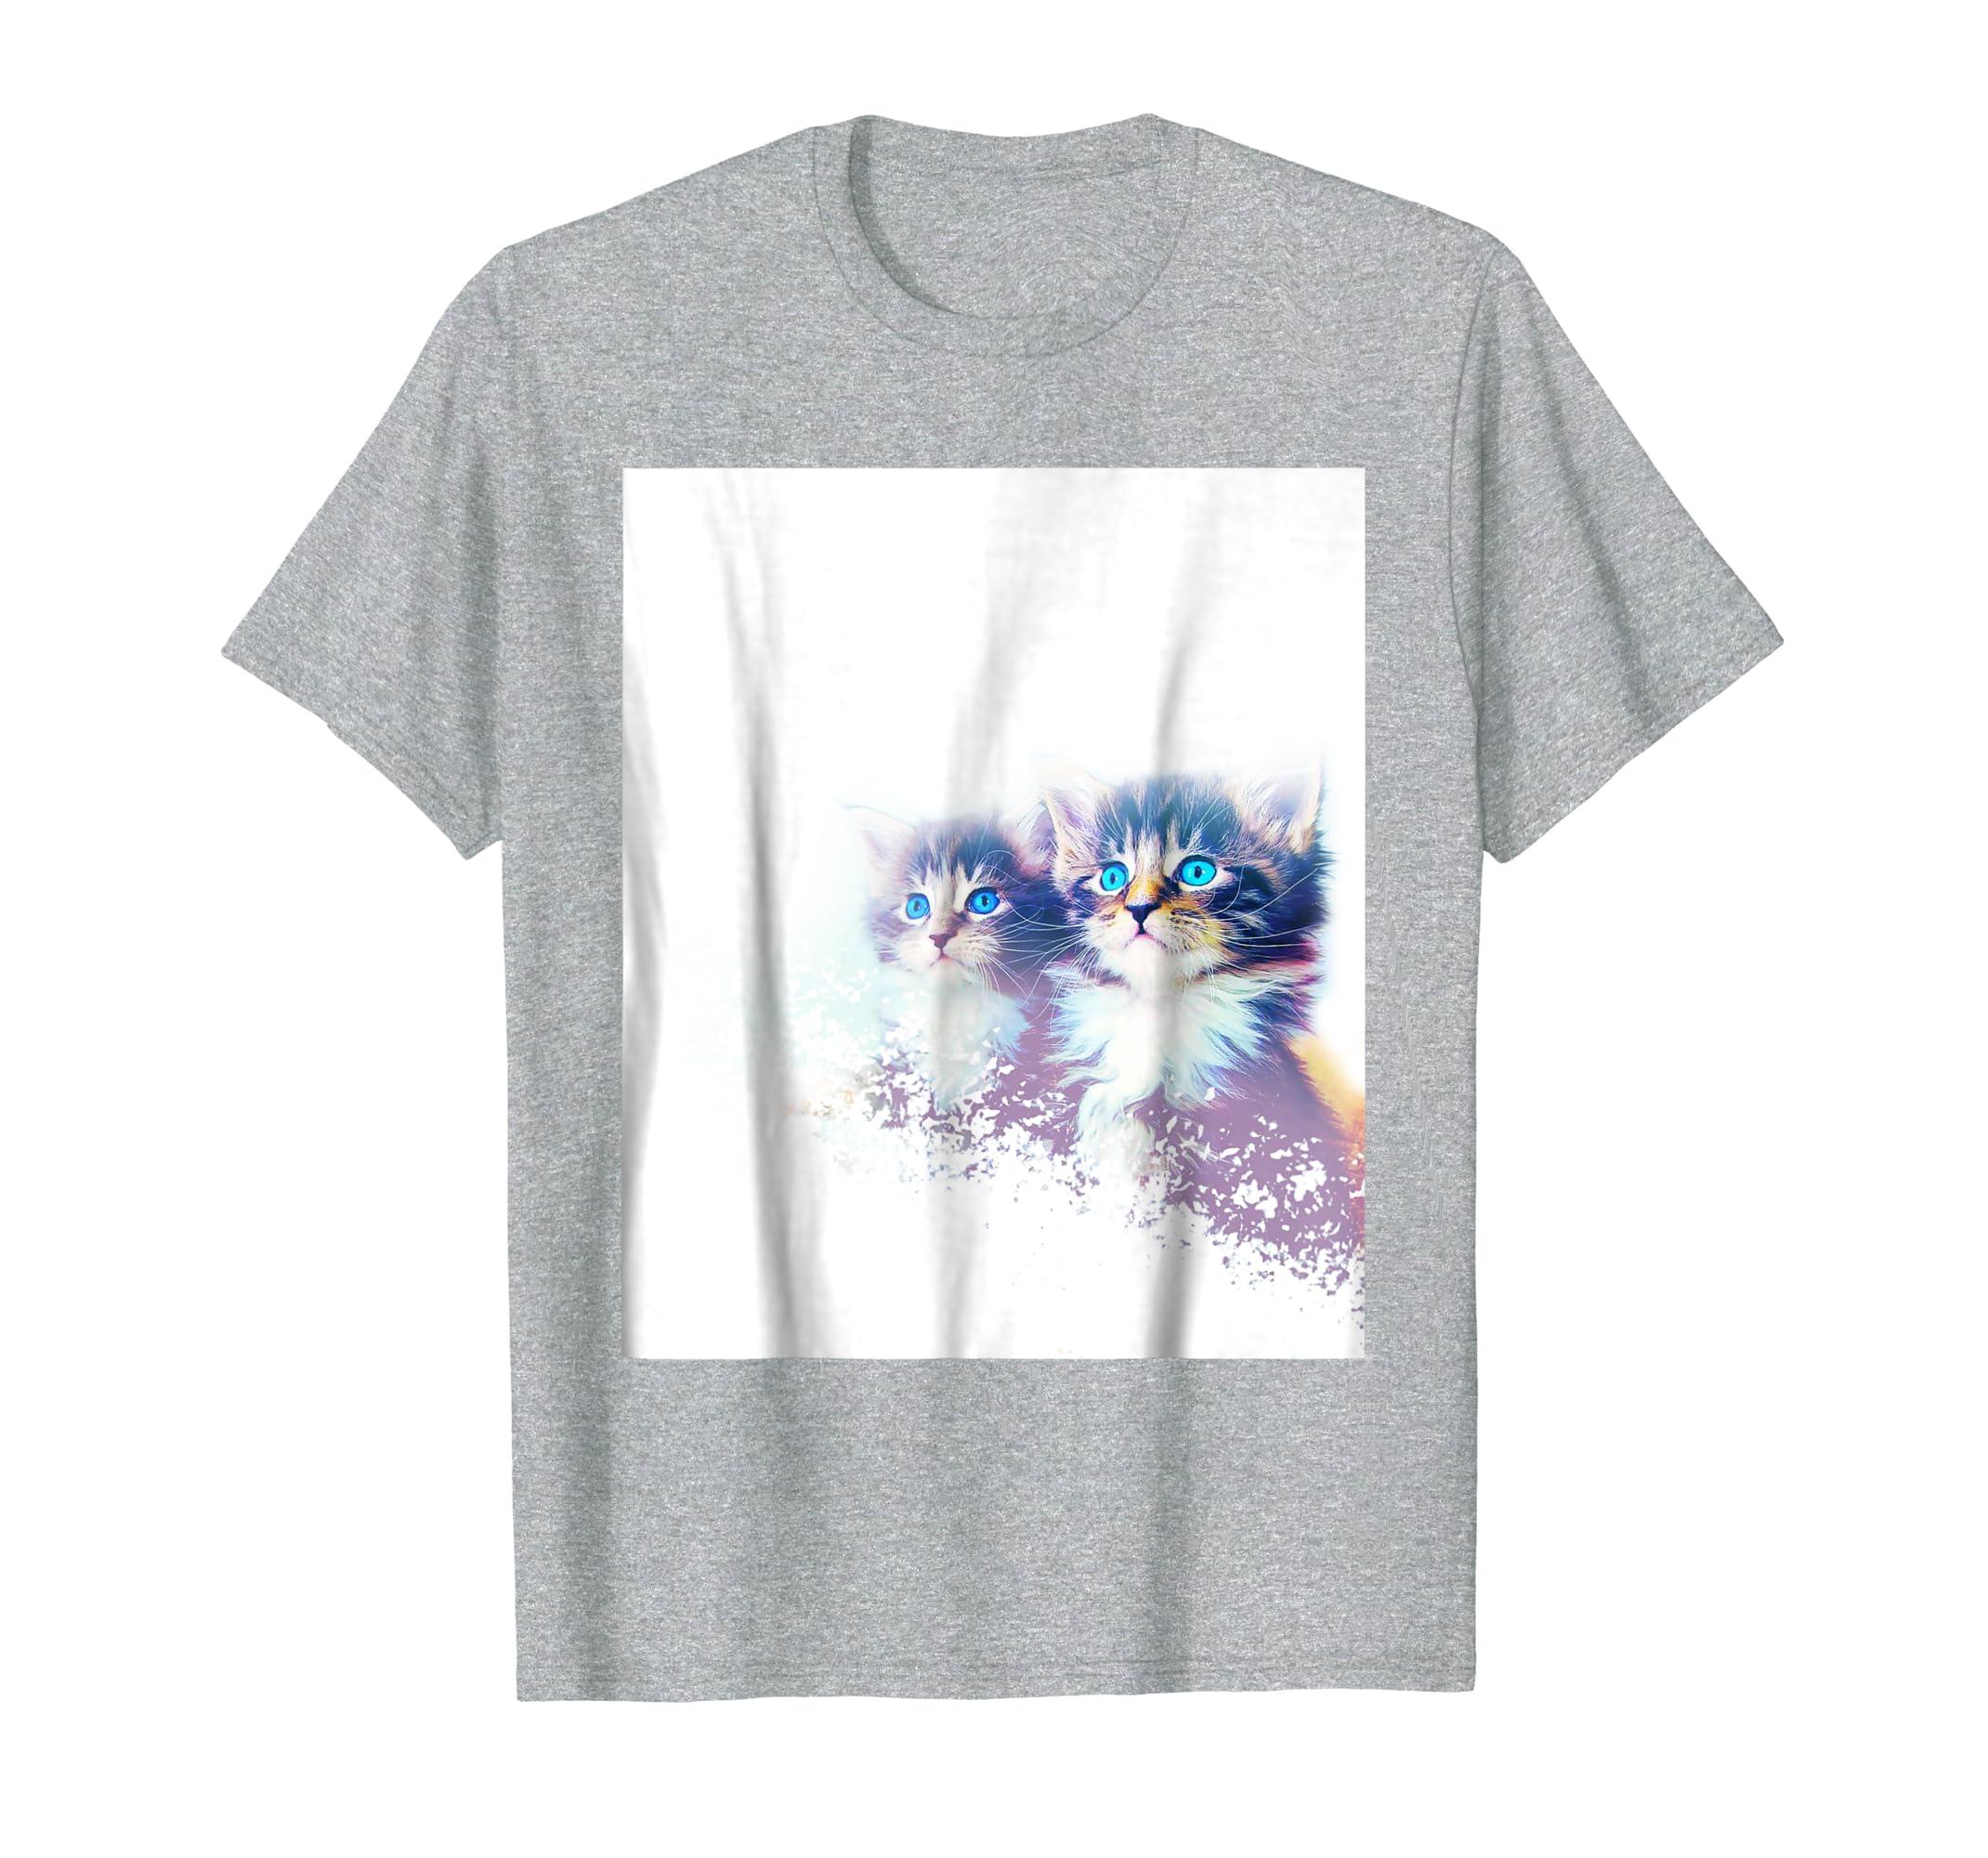 Unisex Cat lovers cute T shirt top